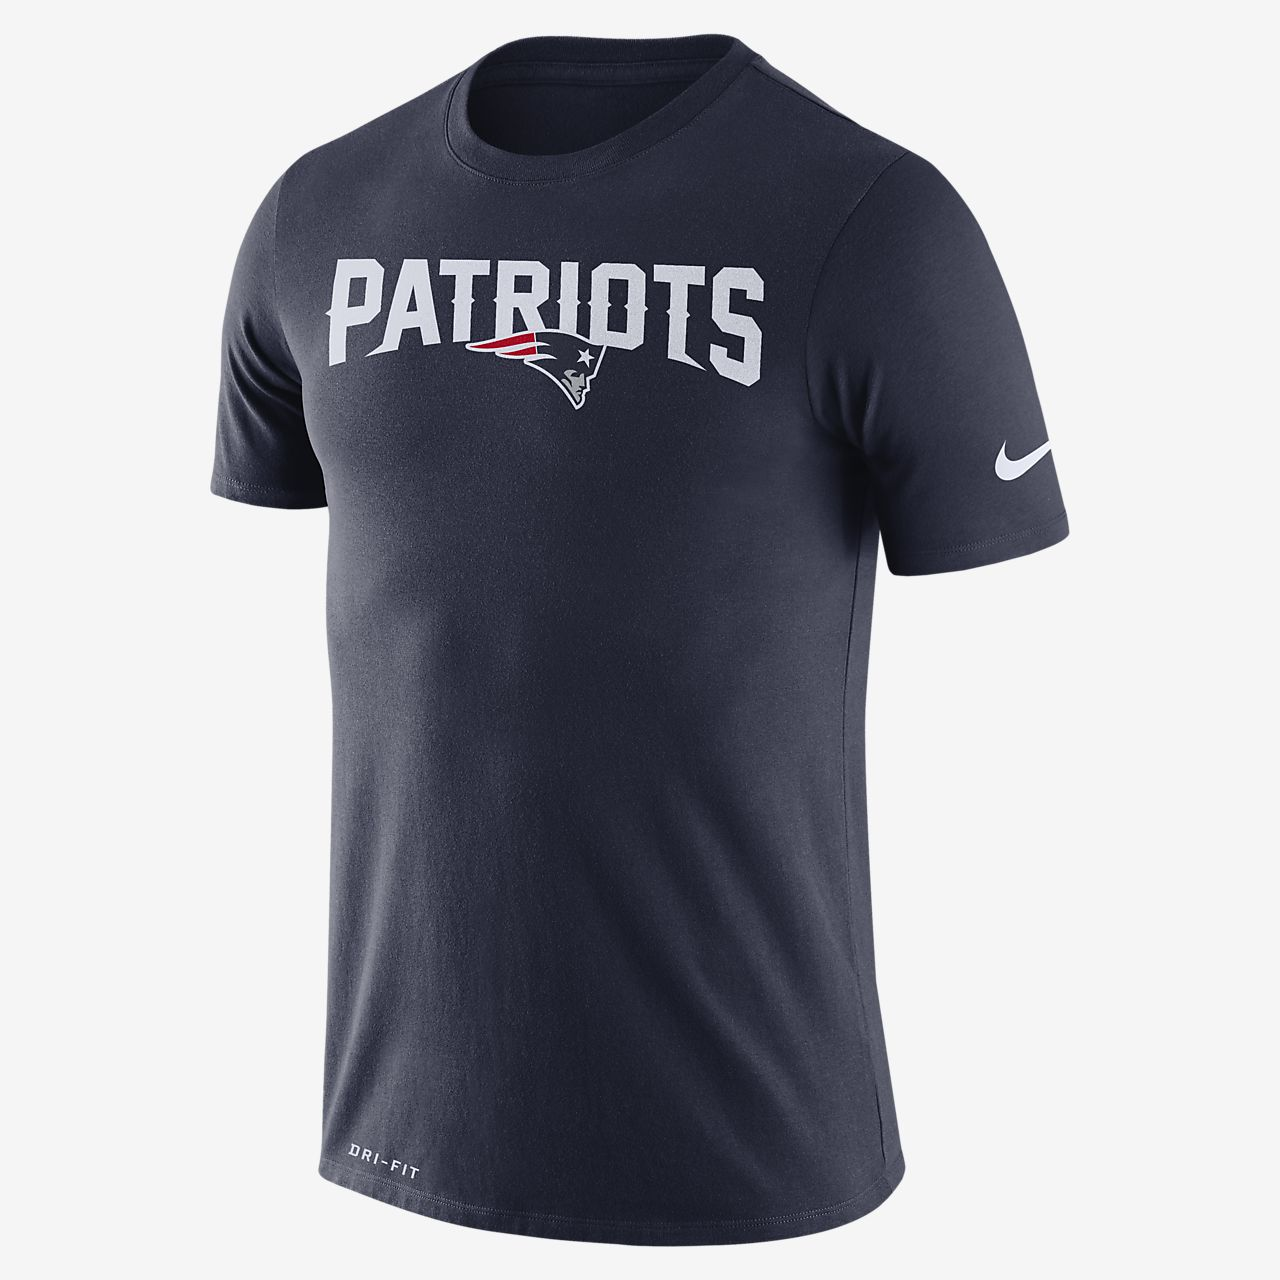 Nike Dri-FIT (NFL Patriots) T-skjorte til herre